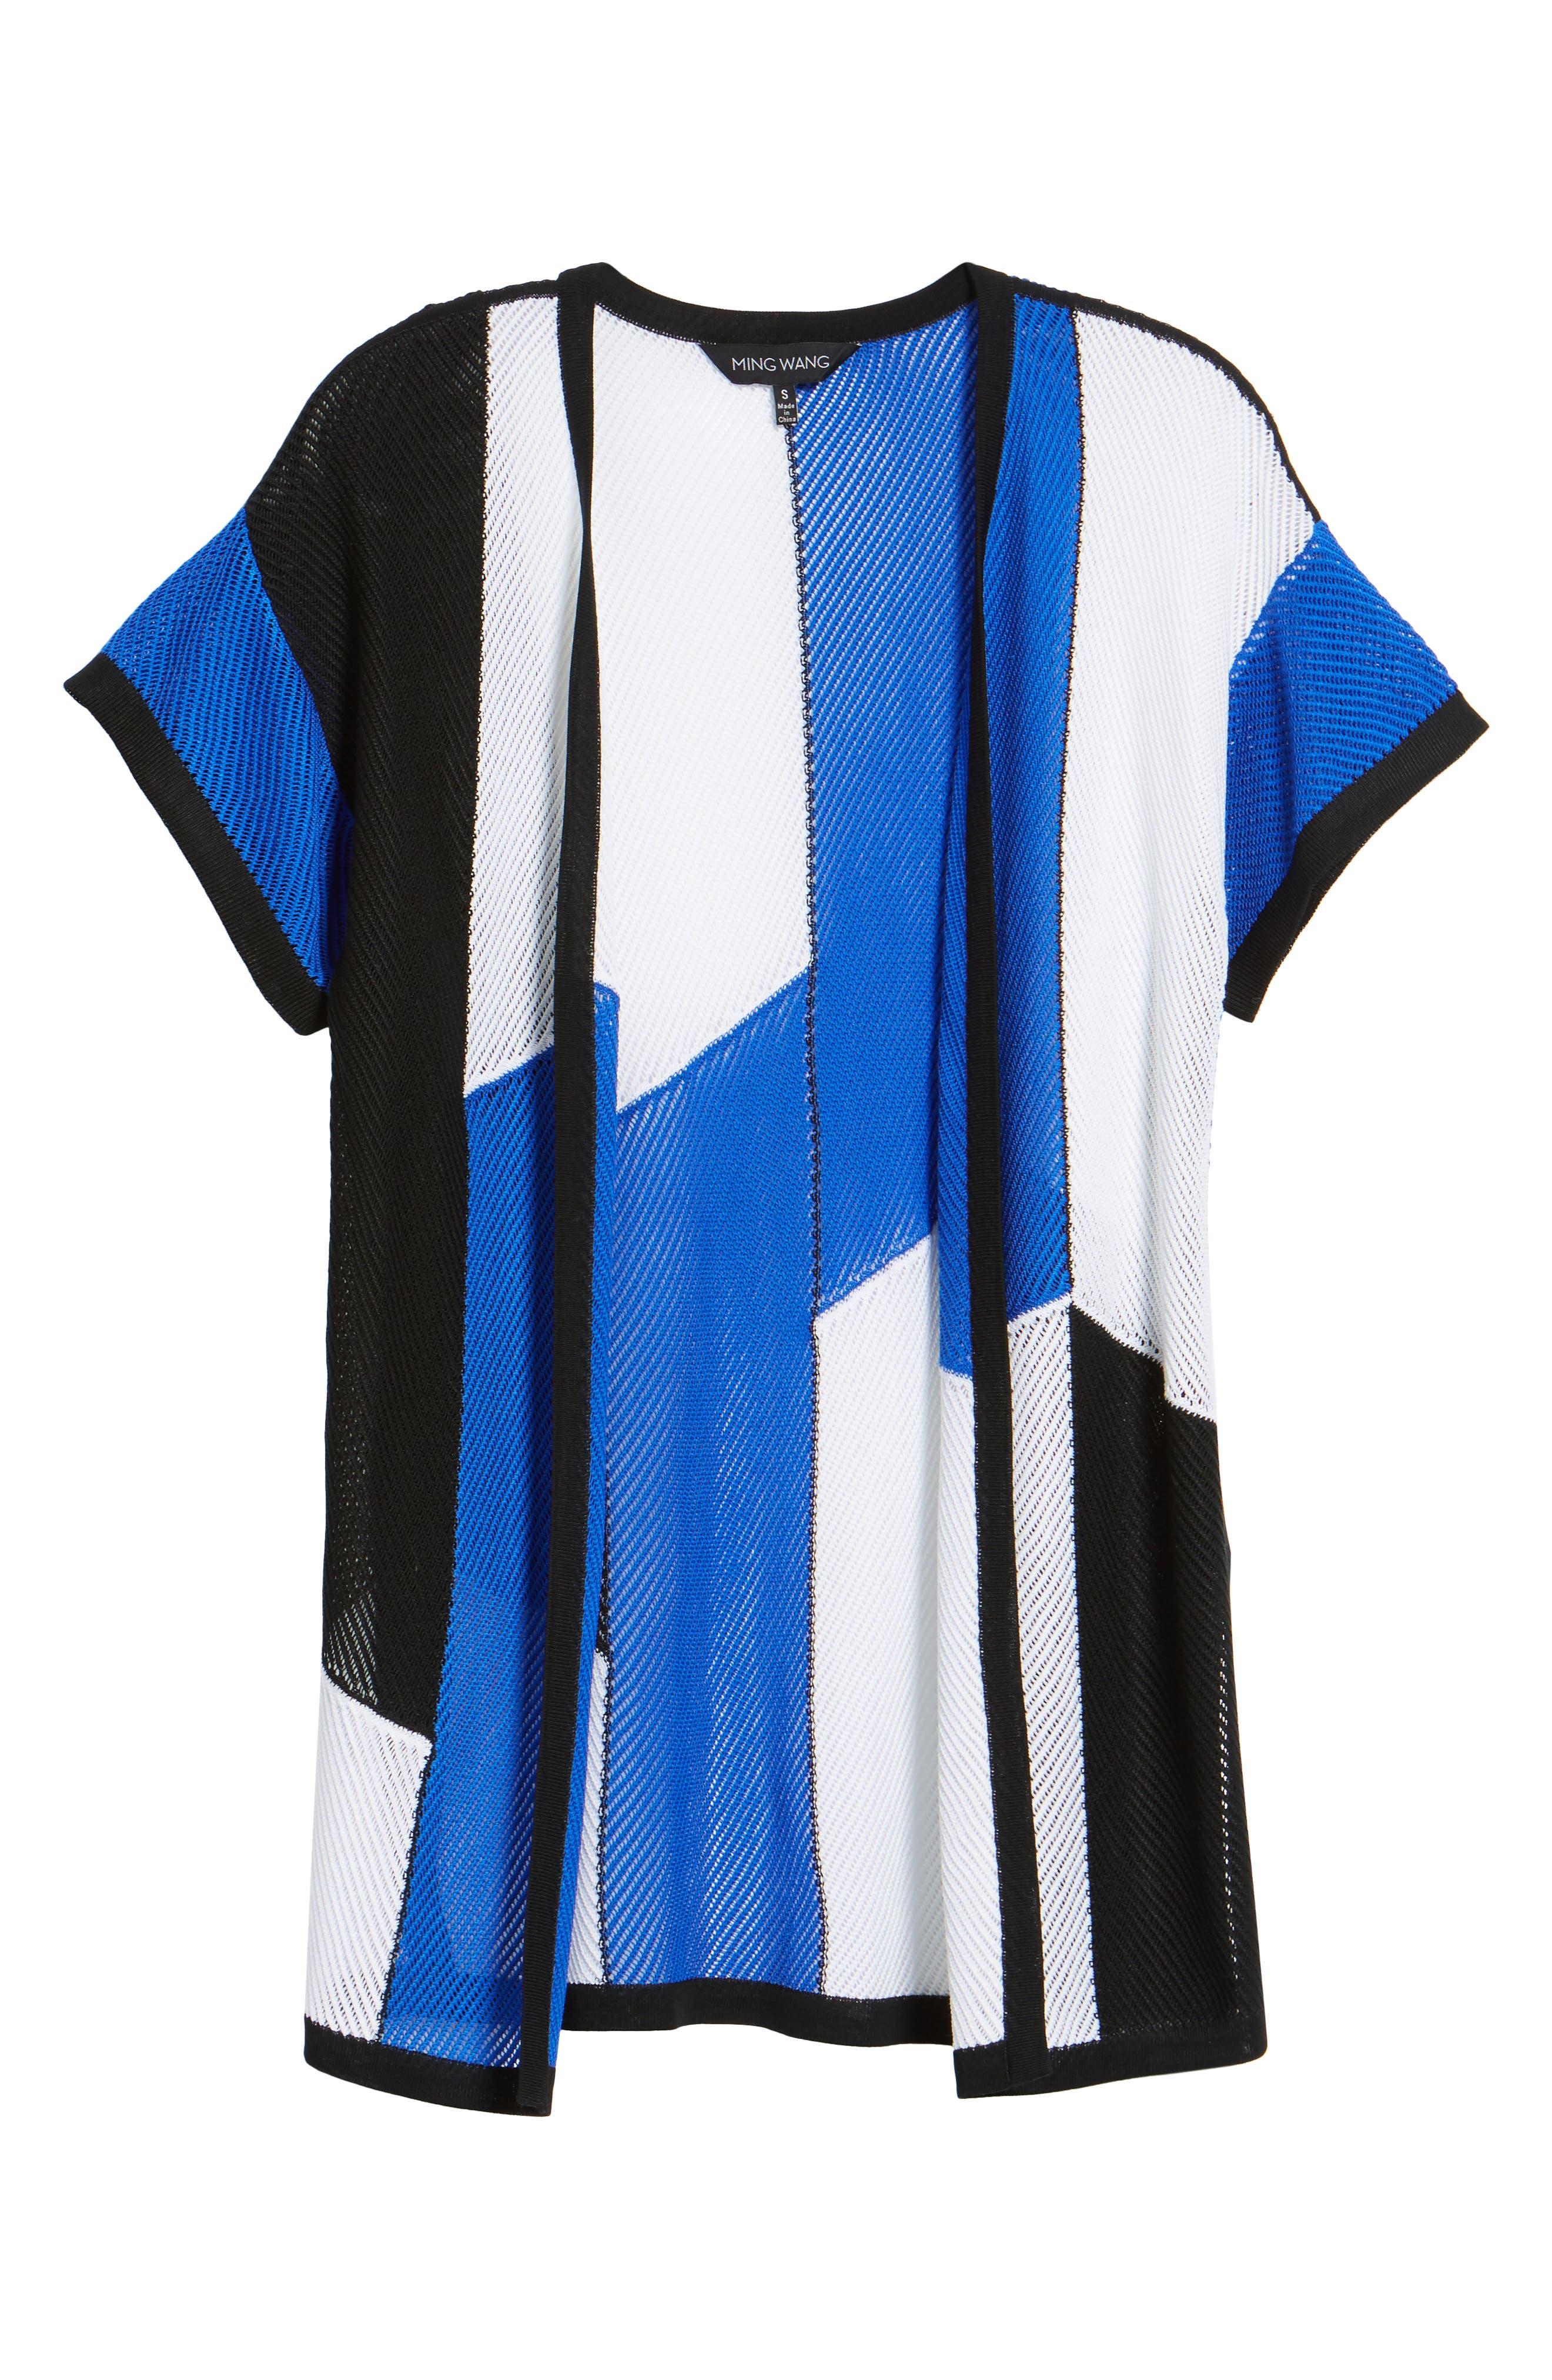 Colorblock Short Sleeve Cardigan,                             Alternate thumbnail 6, color,                             White/ Black/ Patriot Blue